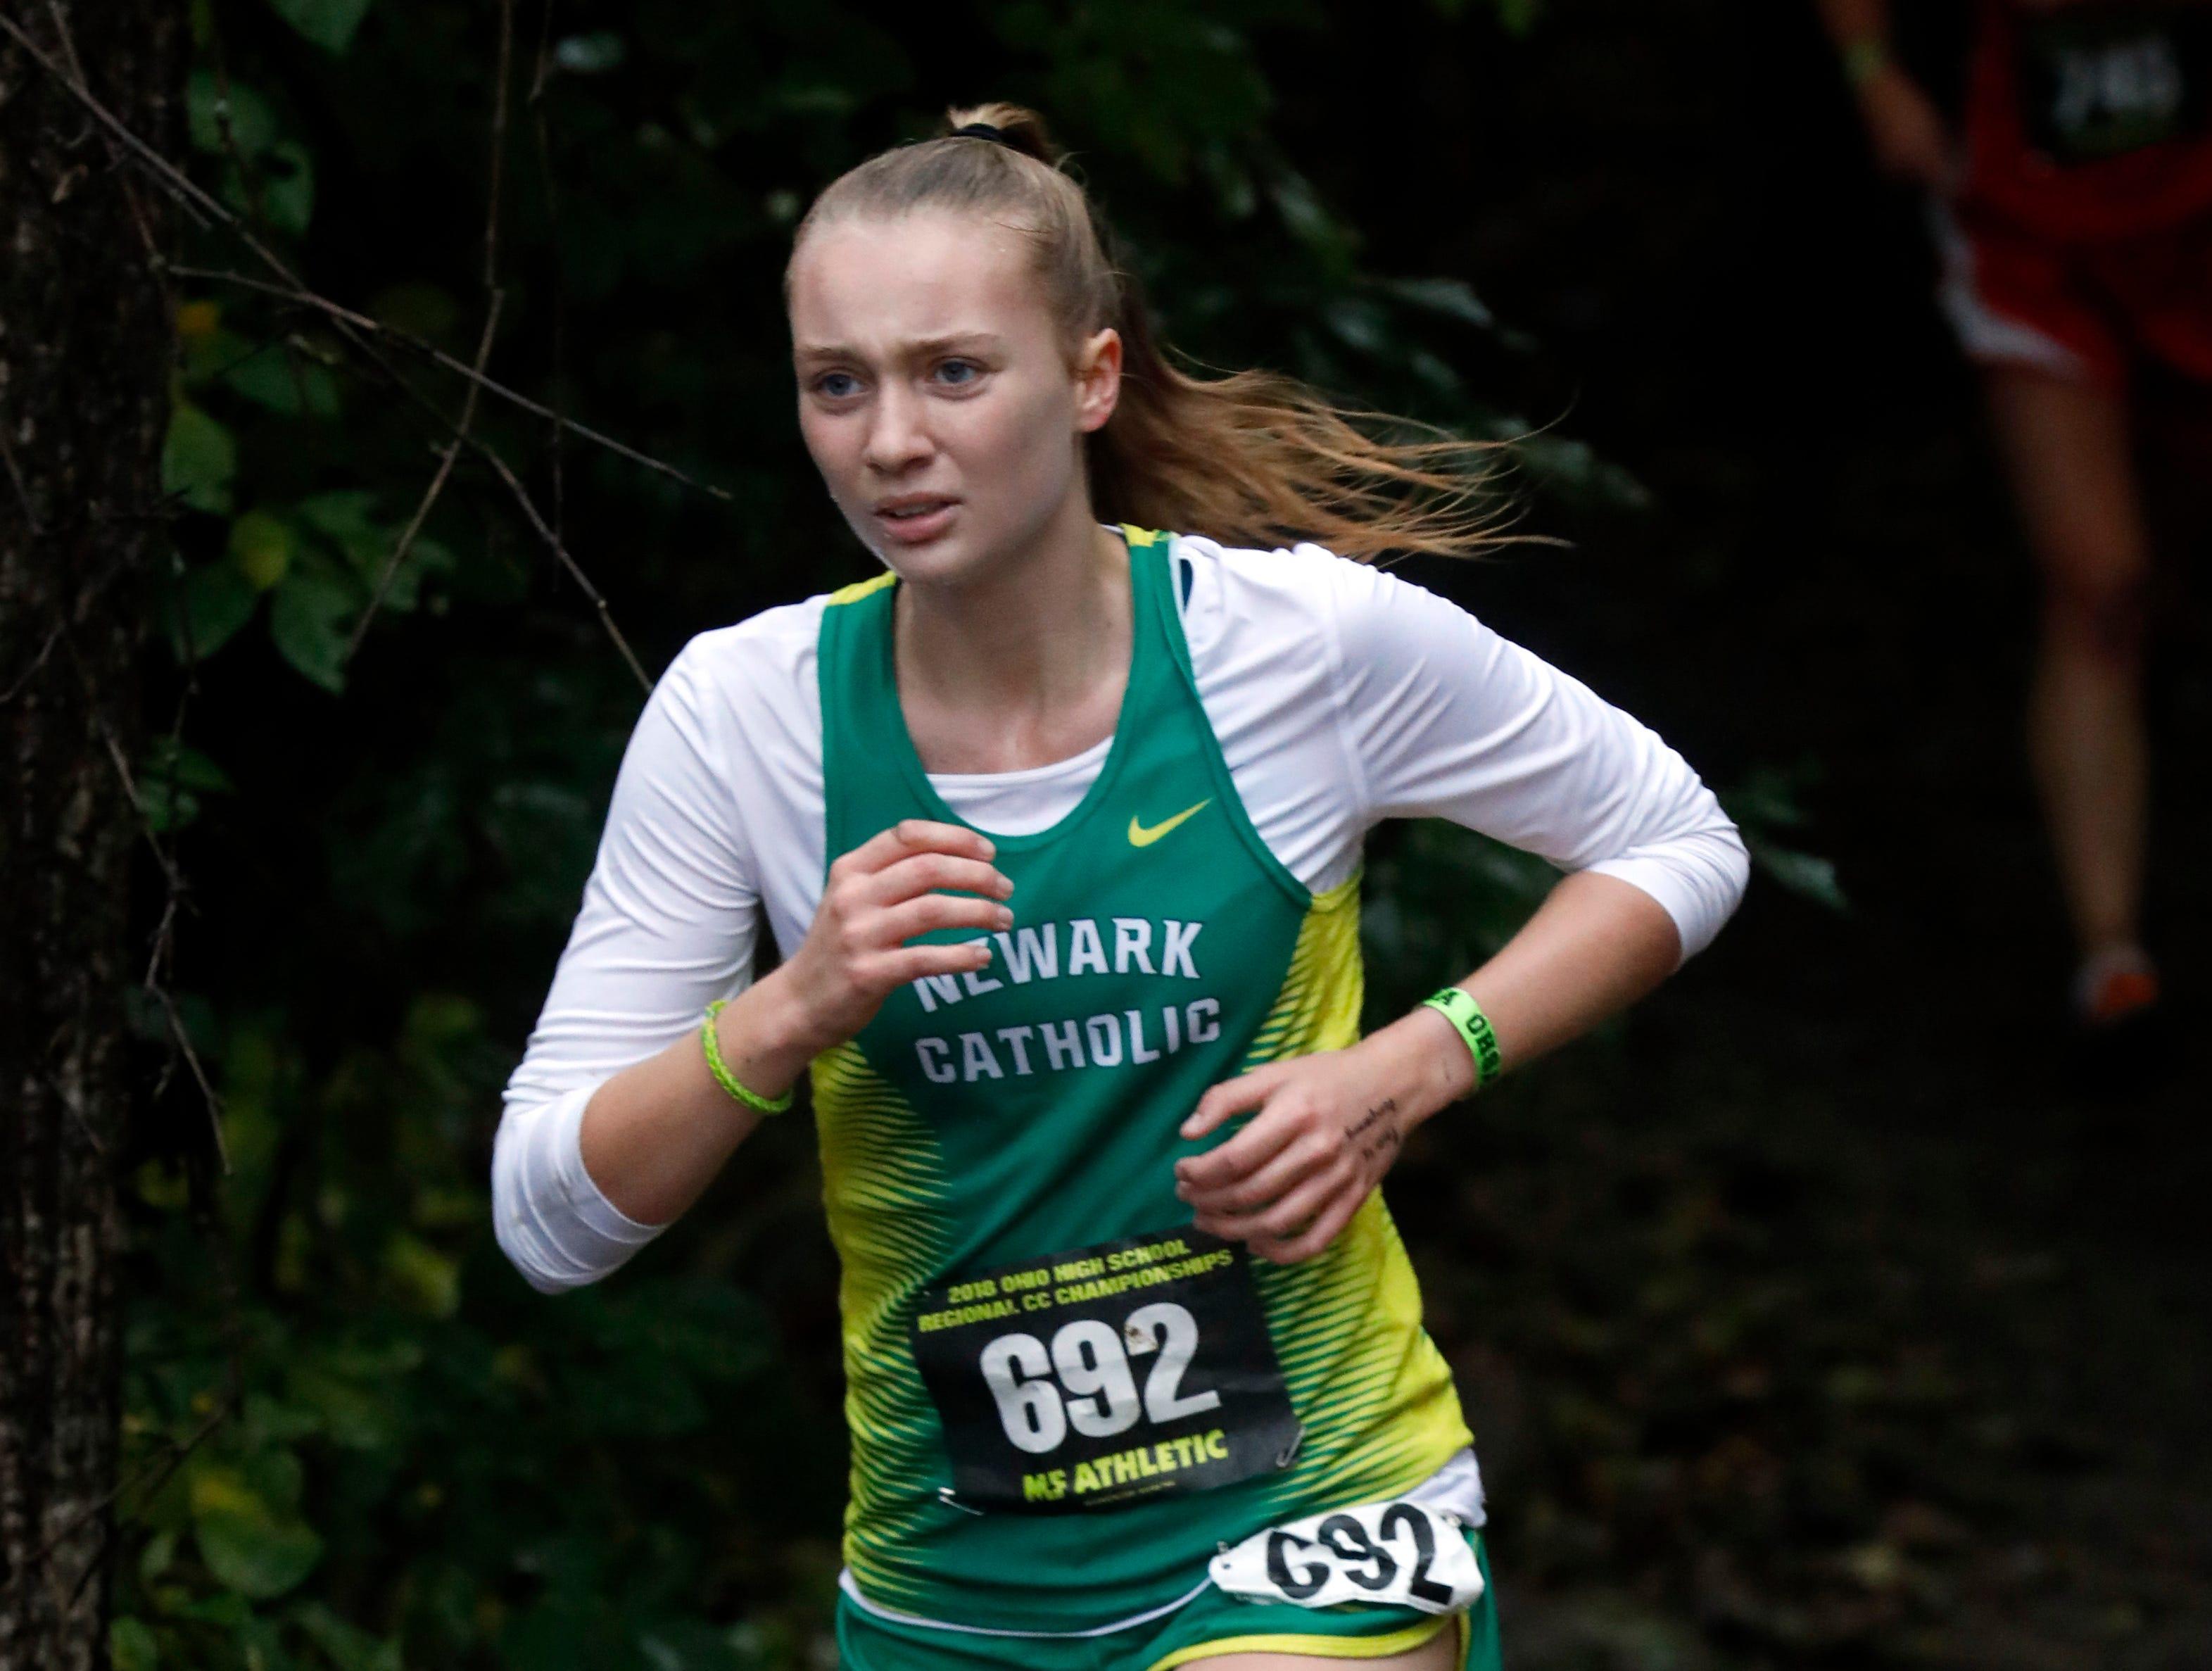 Newark Catholic's Charlotte Campbell runs in the Regional Cross Country meet Saturday, Oct. 27, 2018, at Pickerington North High School in Pickerington.